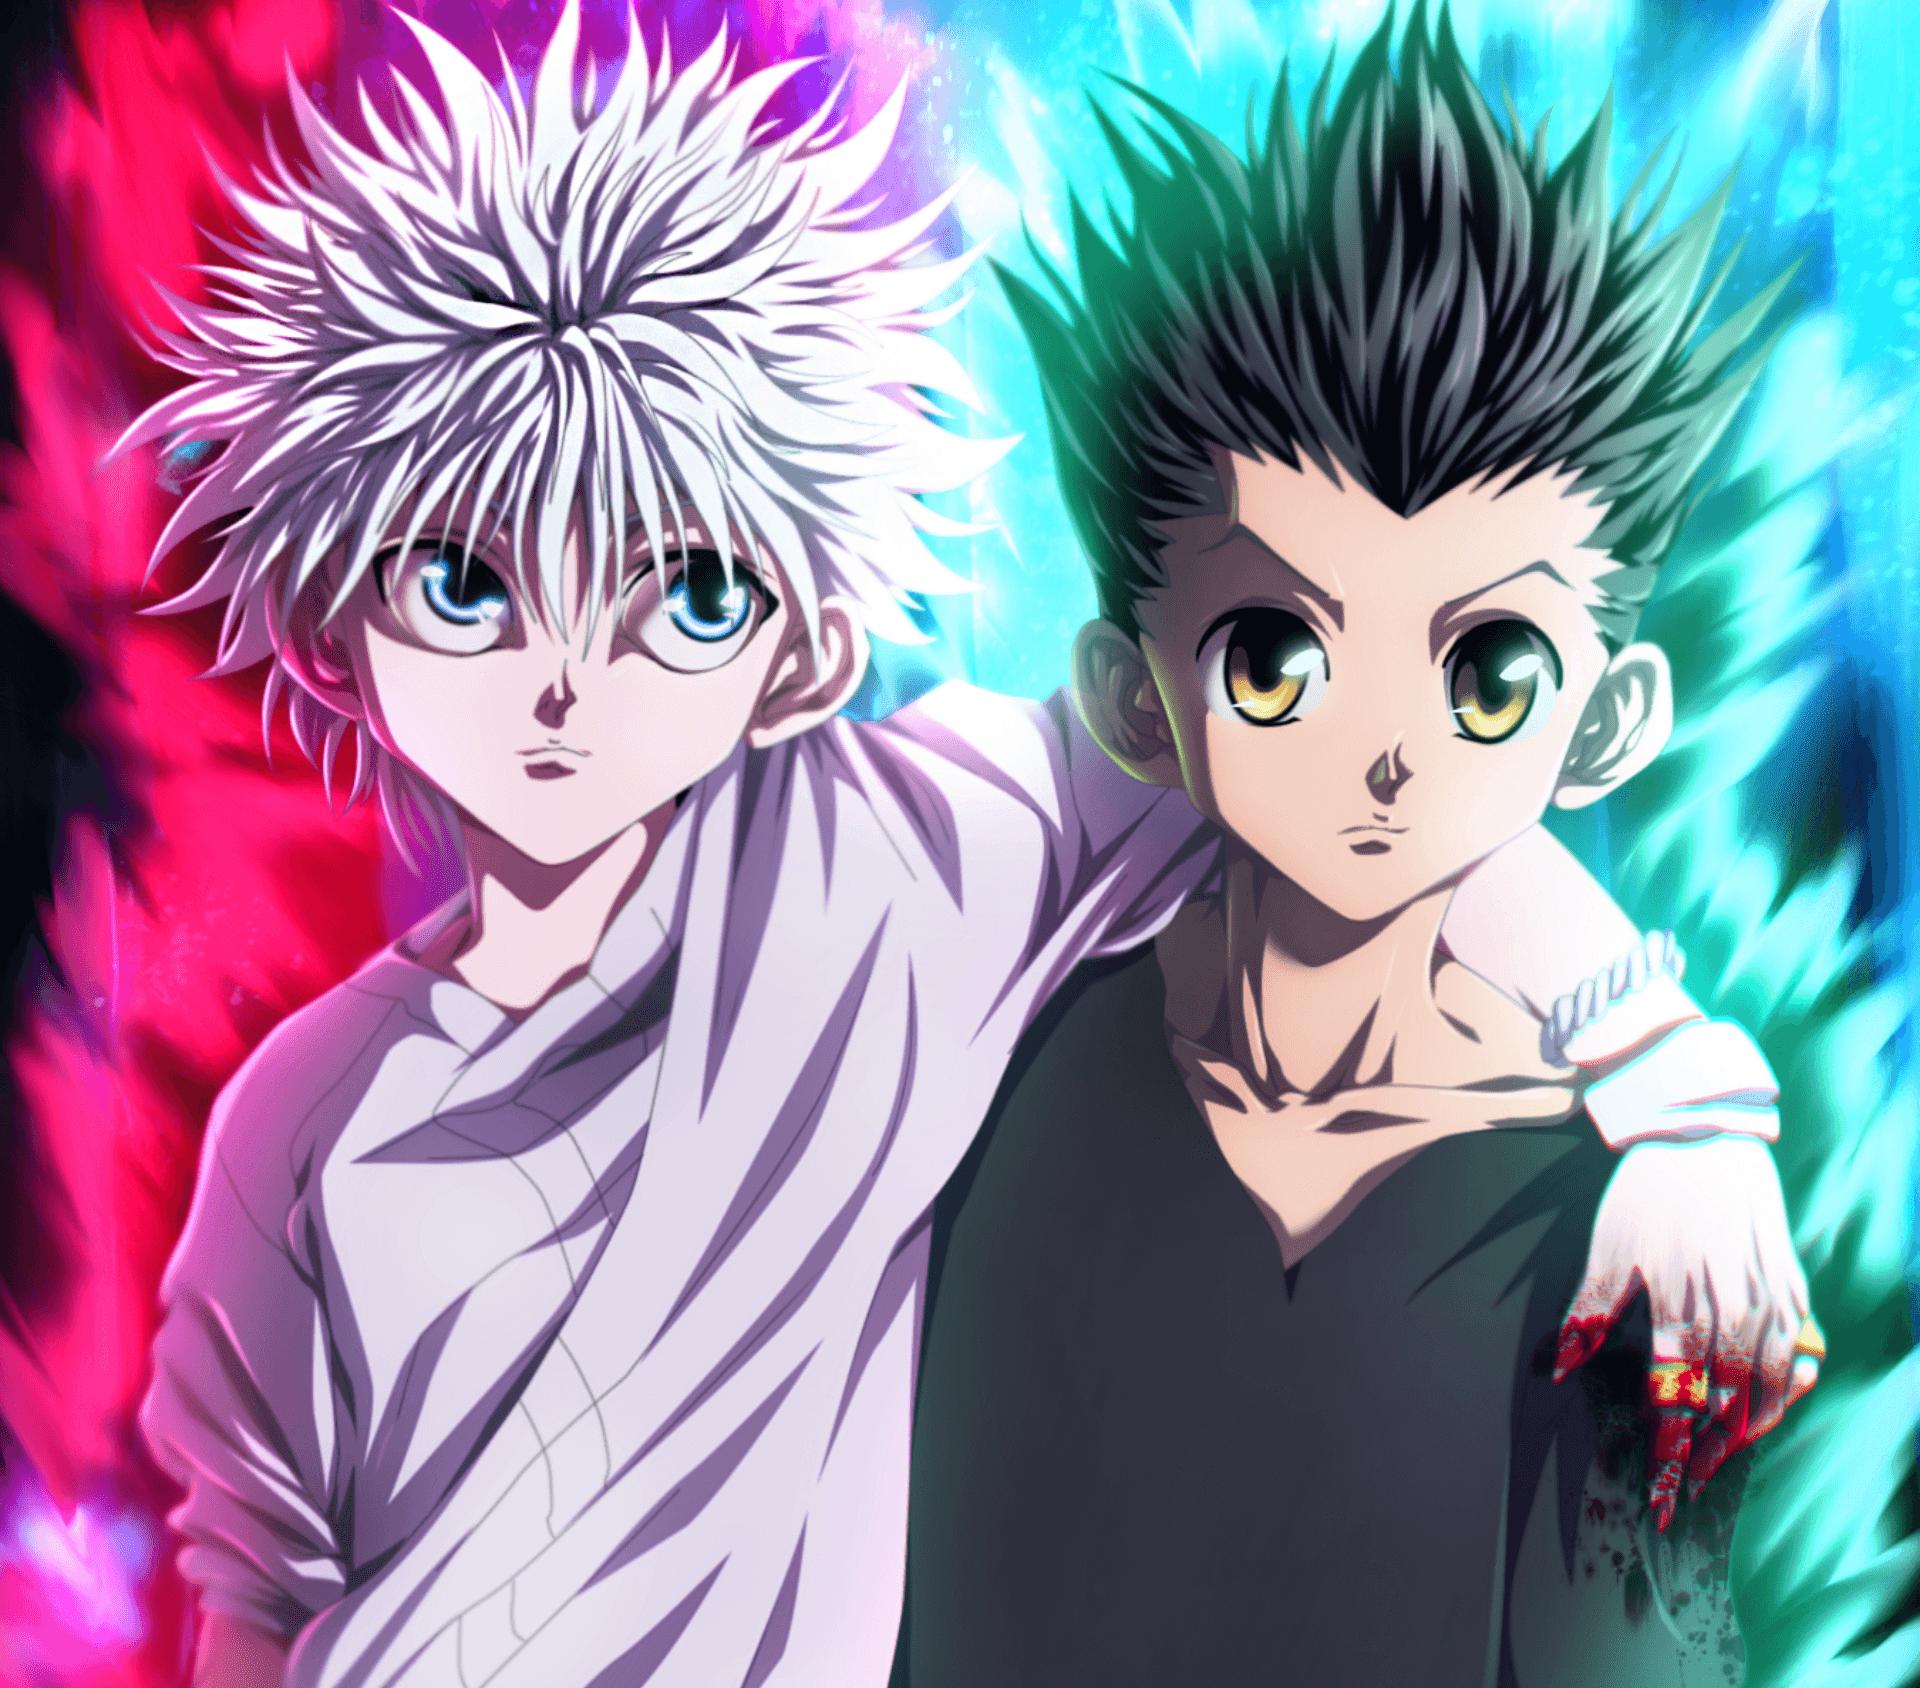 Hunter X Hunter Anime Wallpapers Top Free Hunter X Hunter Anime Backgrounds Wallpaperaccess